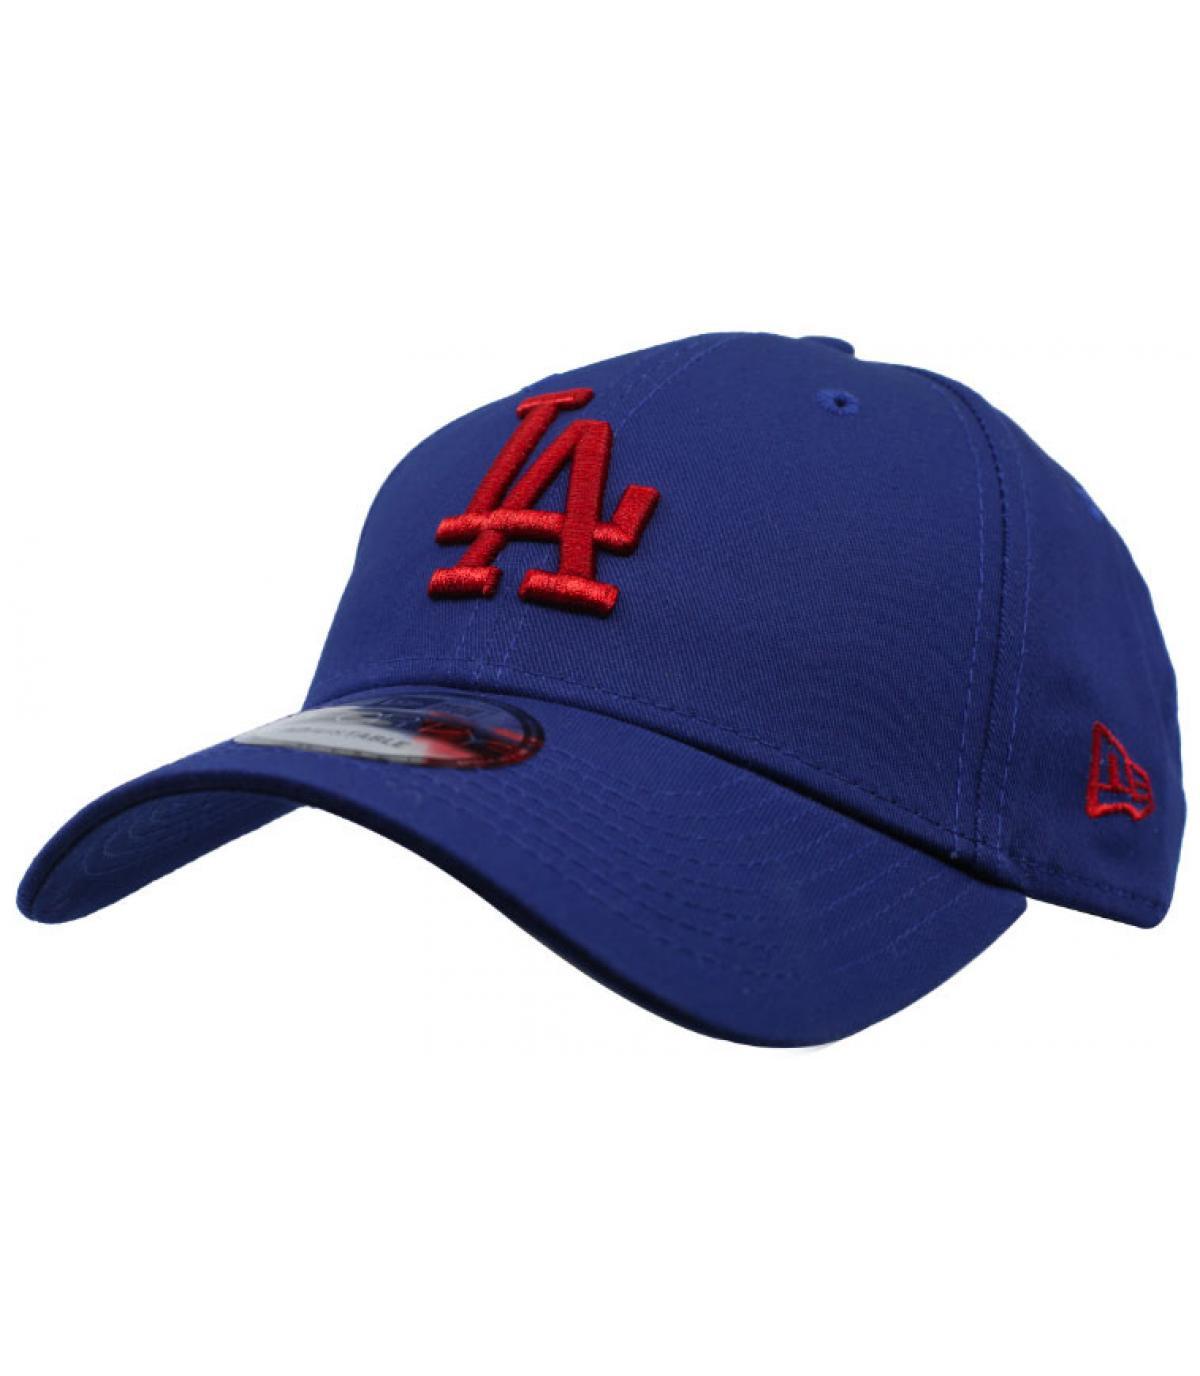 5e2b85c06925 New Era blue cap - Buy online at Headict.